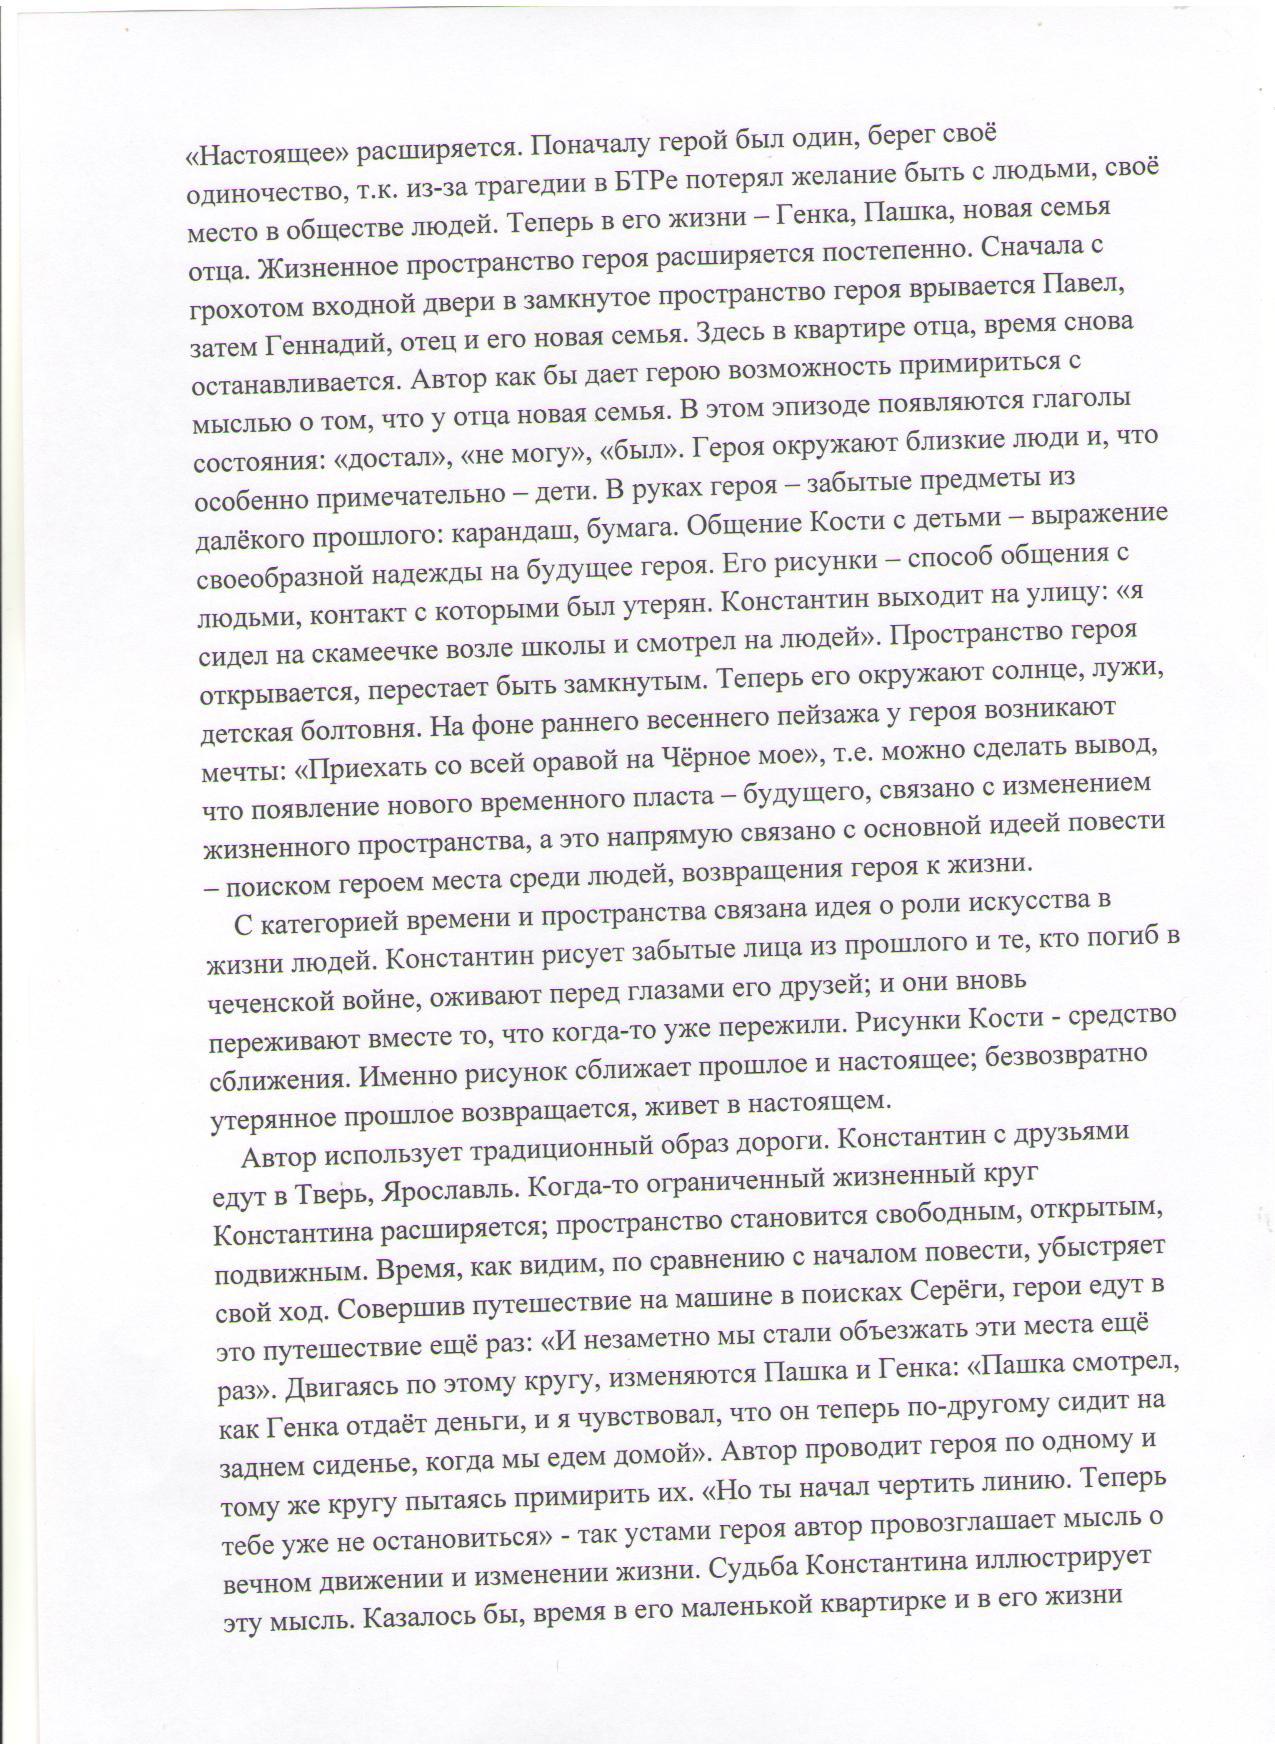 C:\Documents and Settings\Иван\Рабочий стол\gtlcjdtn\изображение 006.jpg